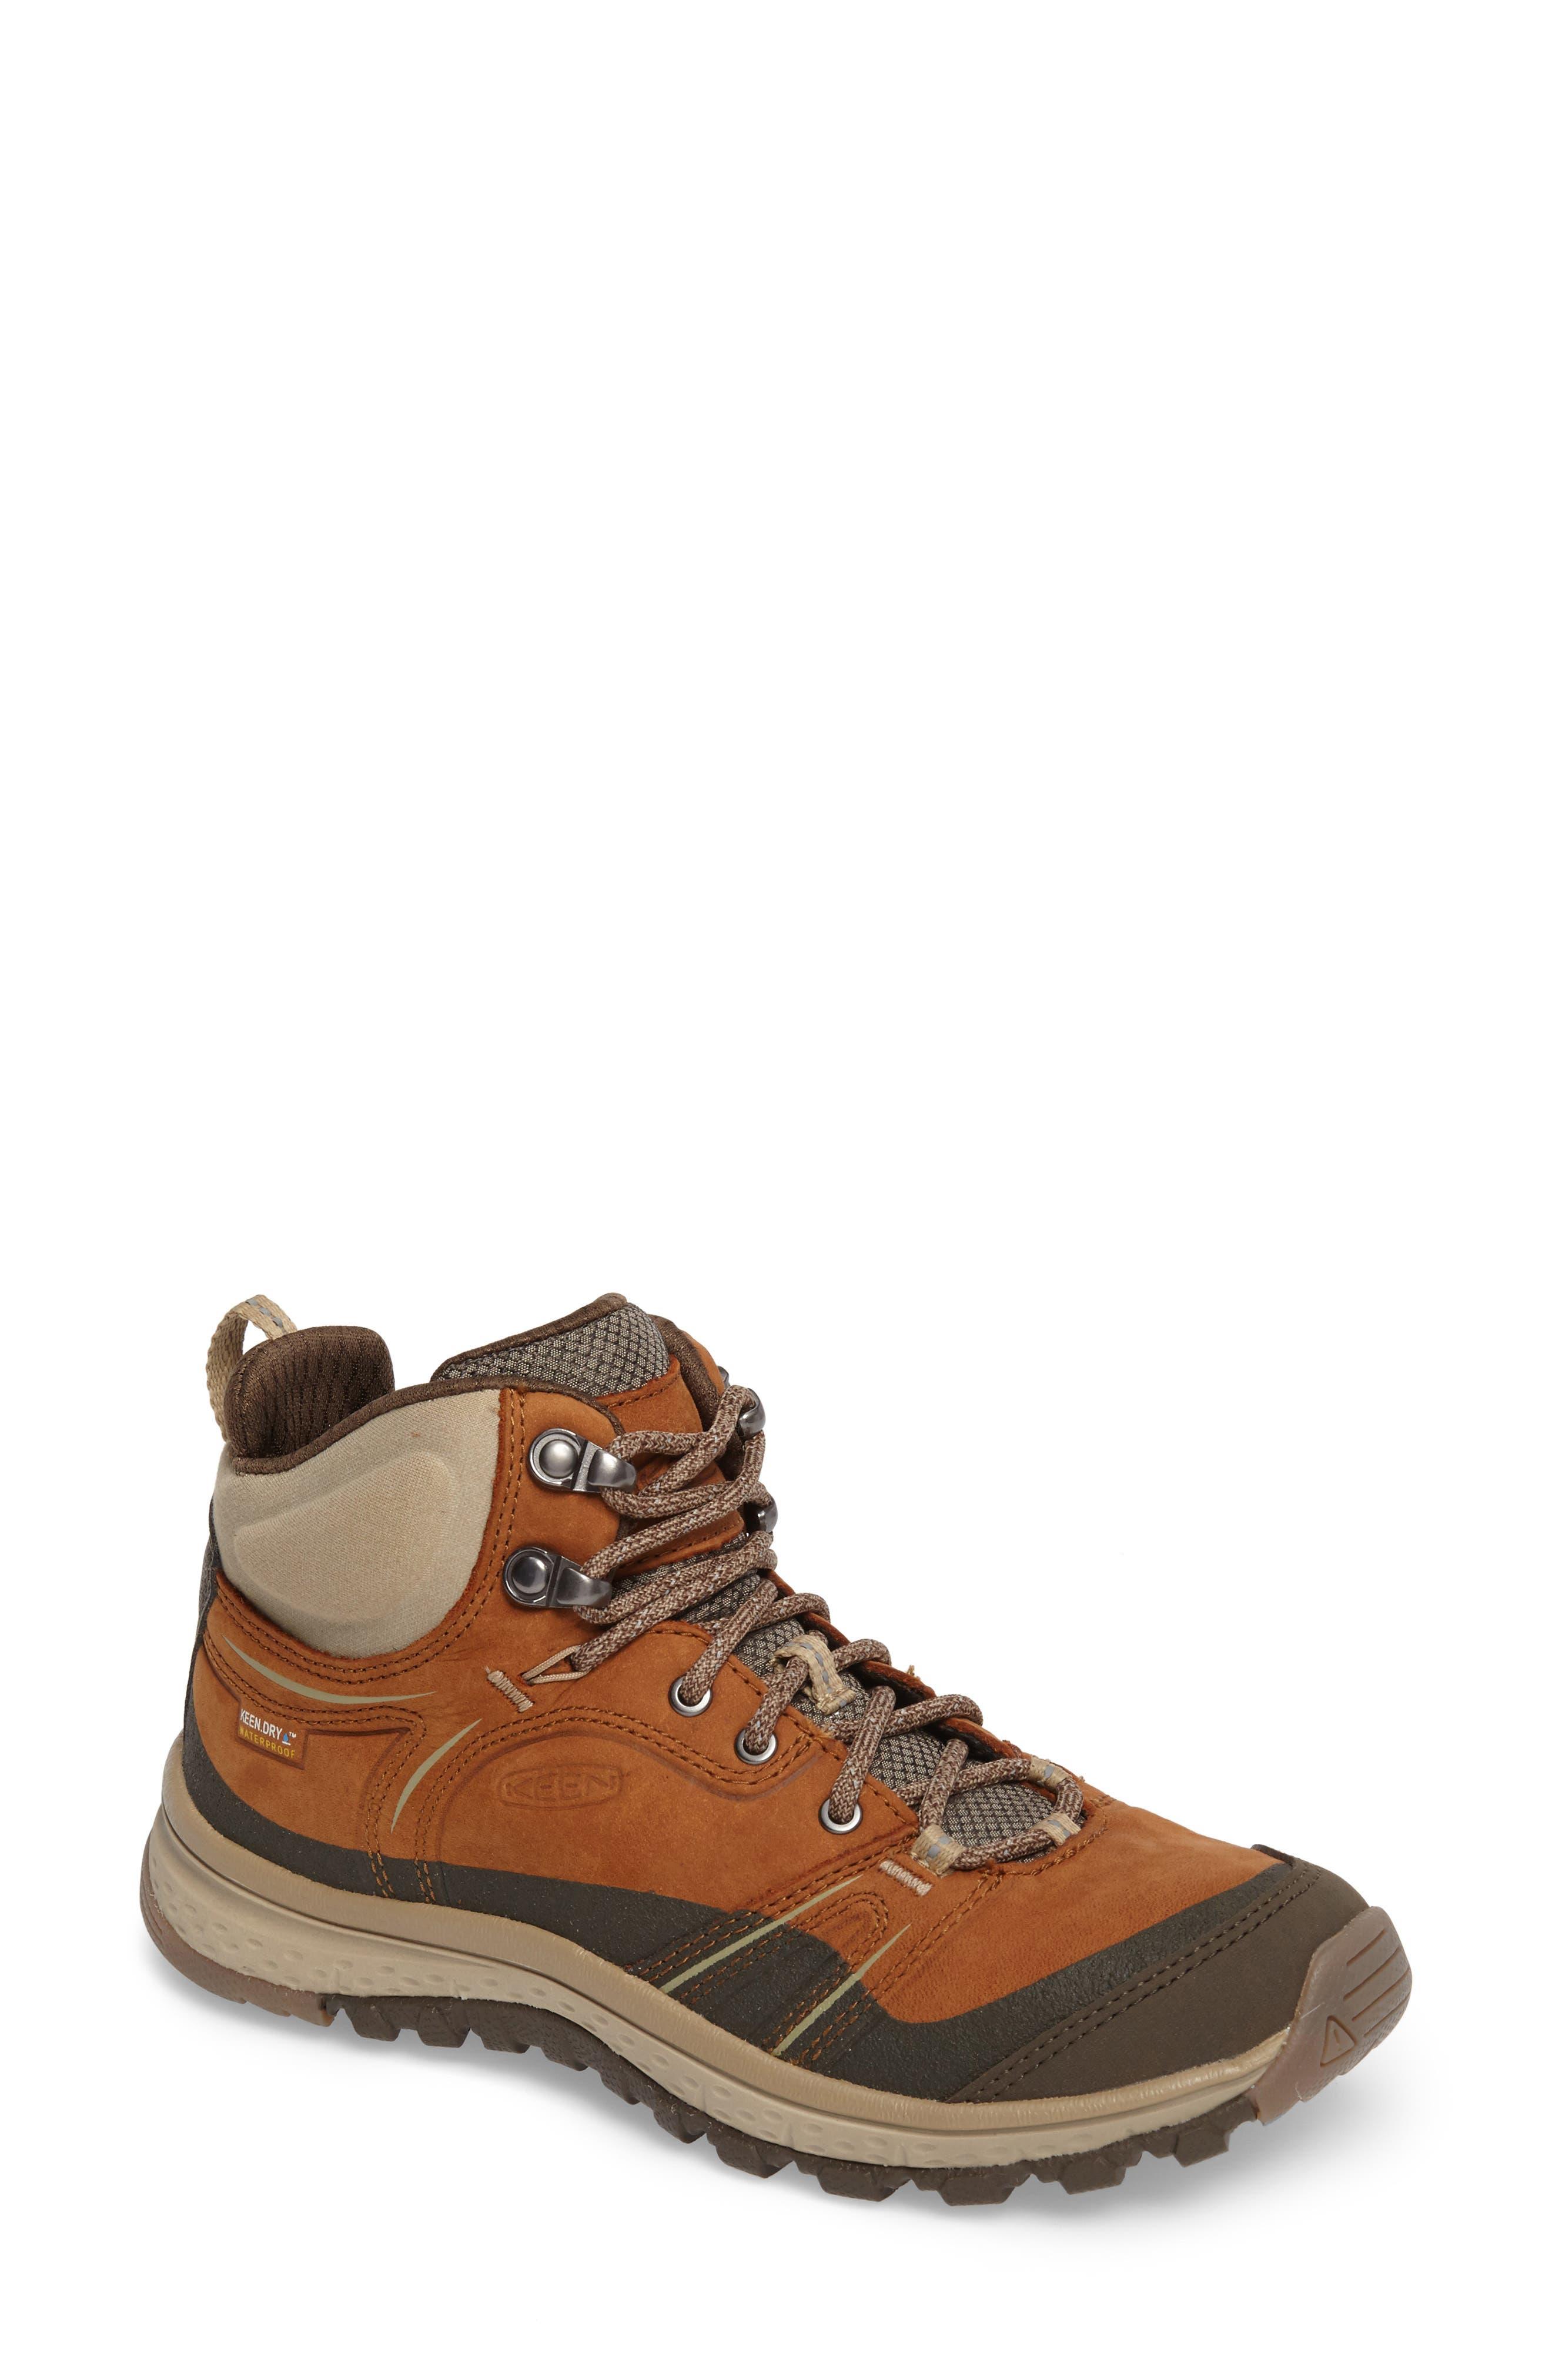 Terradora Leather Waterproof Hiking Boot,                         Main,                         color, TIMBER/ ORANGE NUBUCK